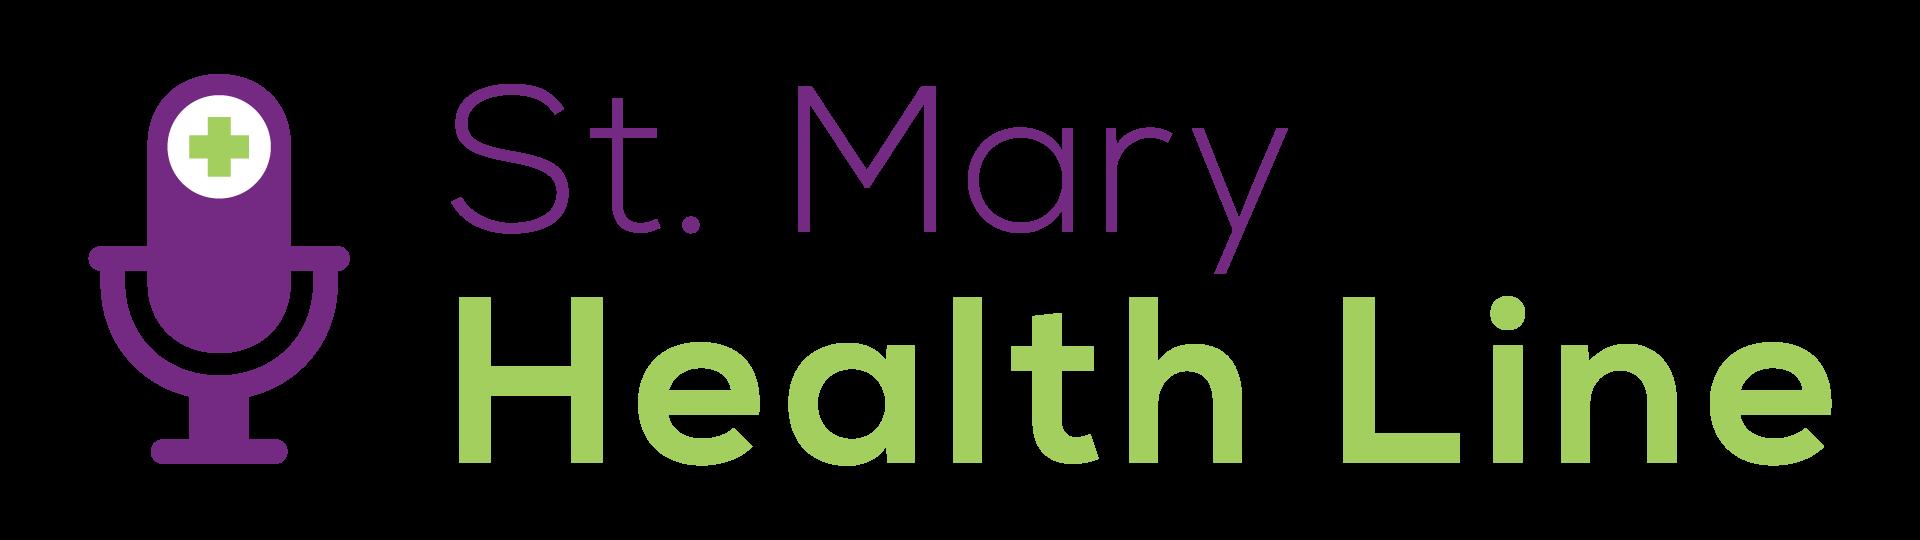 St. Mary Health Line